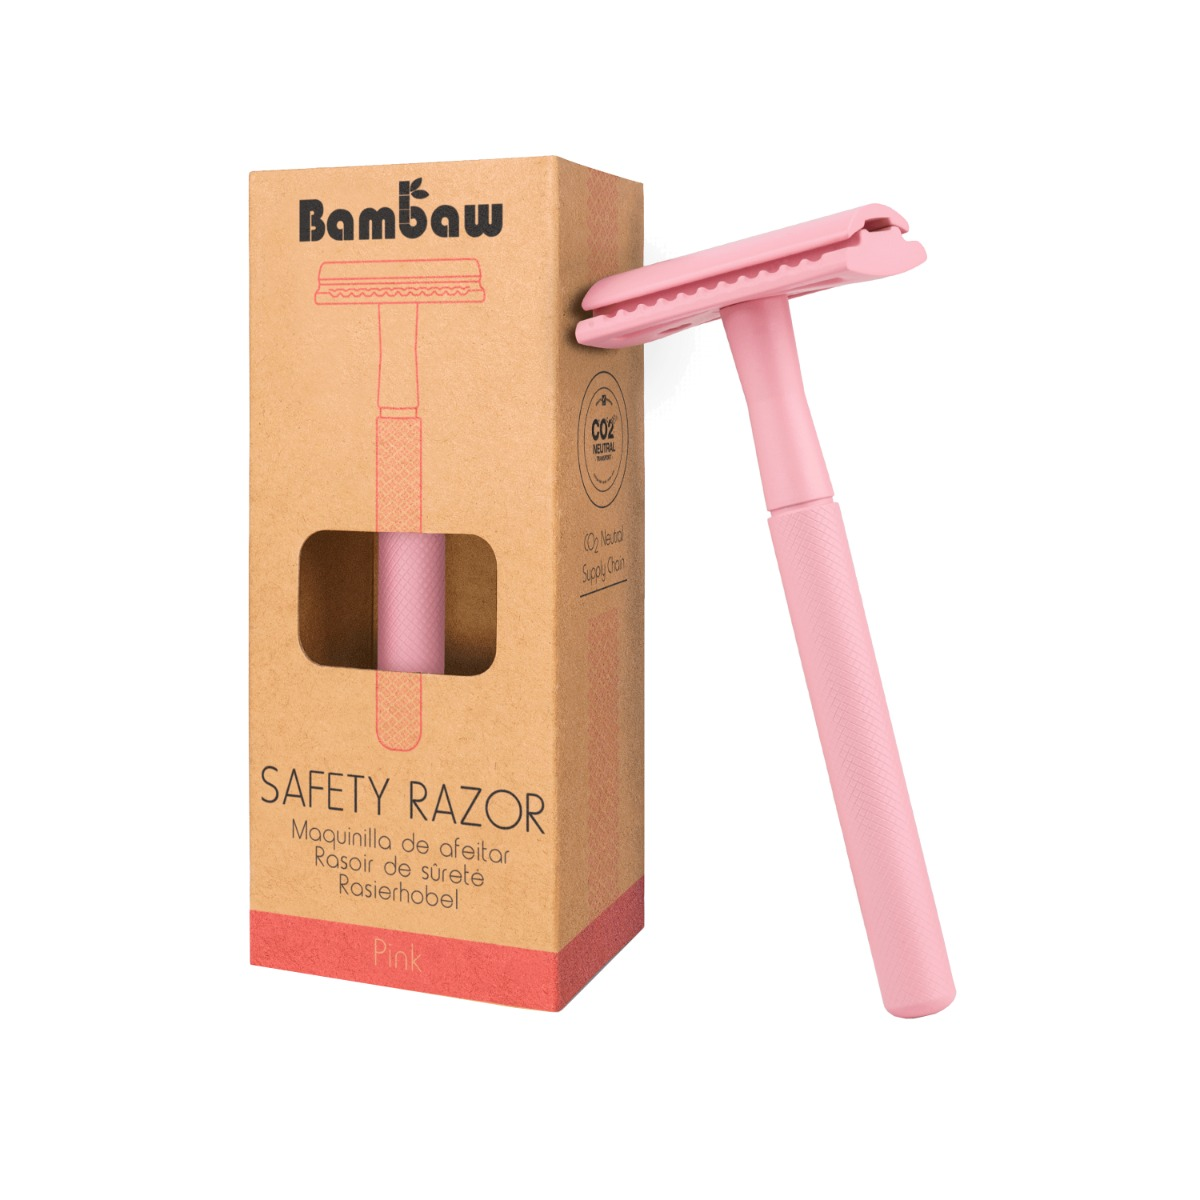 Bambaw Metal Eco Safety Razor - Pink